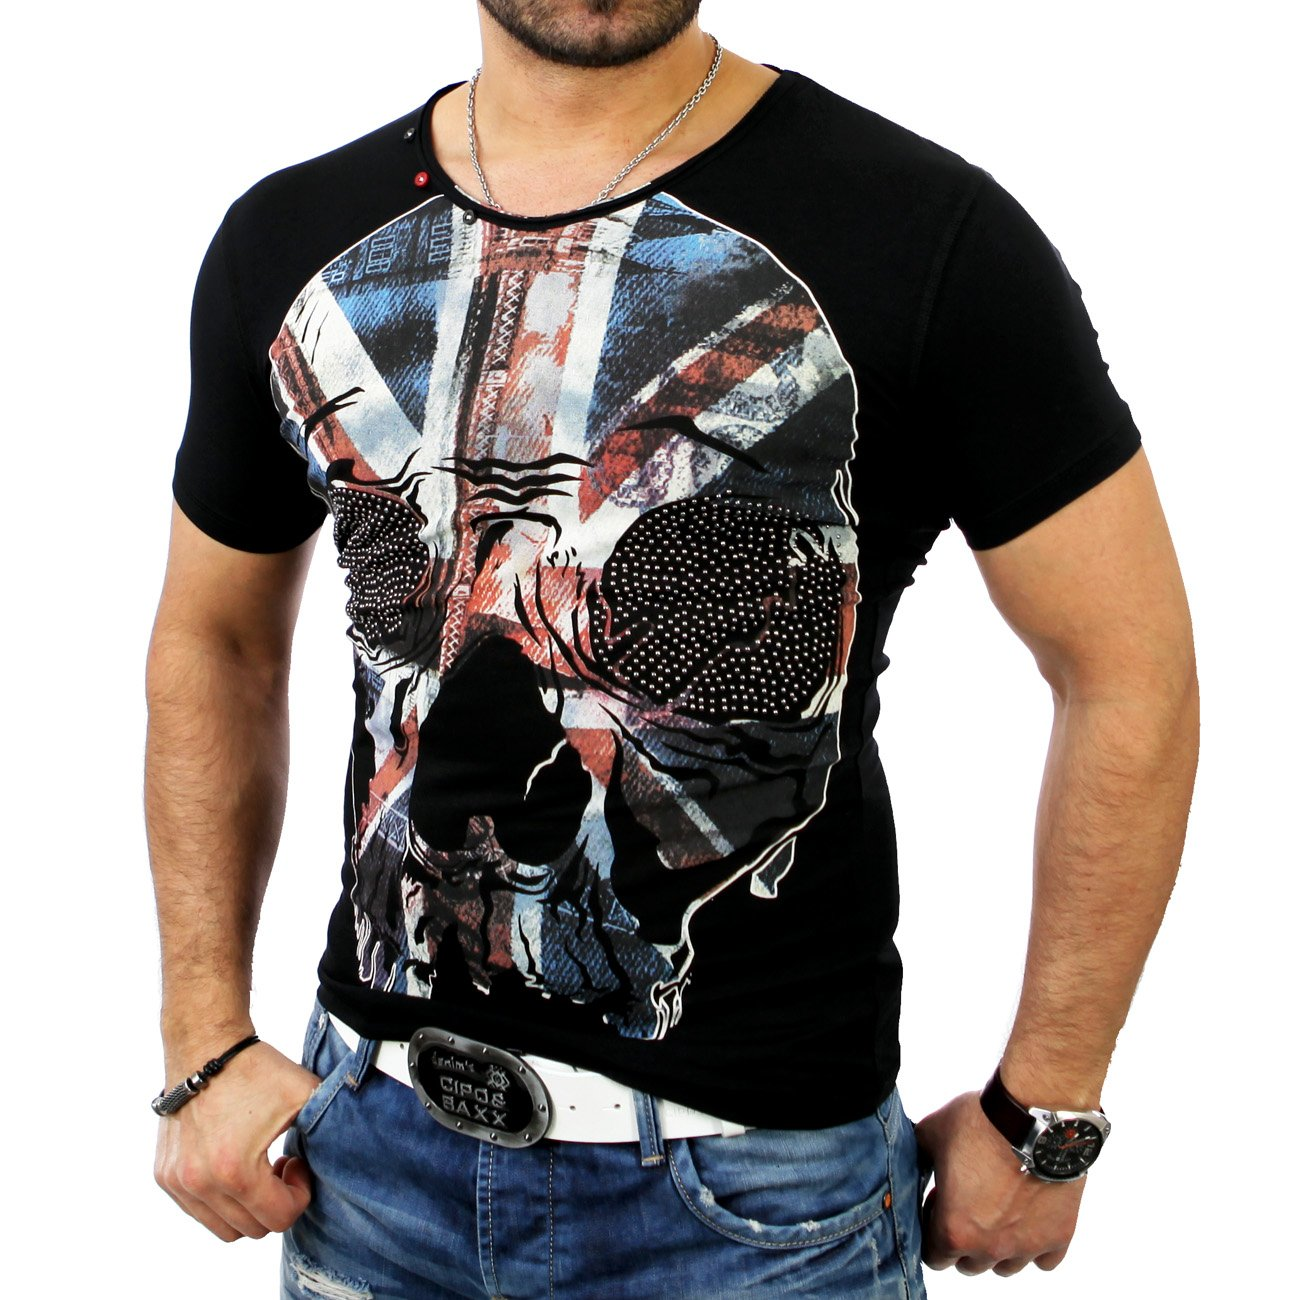 totenkopf shirt cipo baxx t shirt mit skull c 5320 g nstig. Black Bedroom Furniture Sets. Home Design Ideas